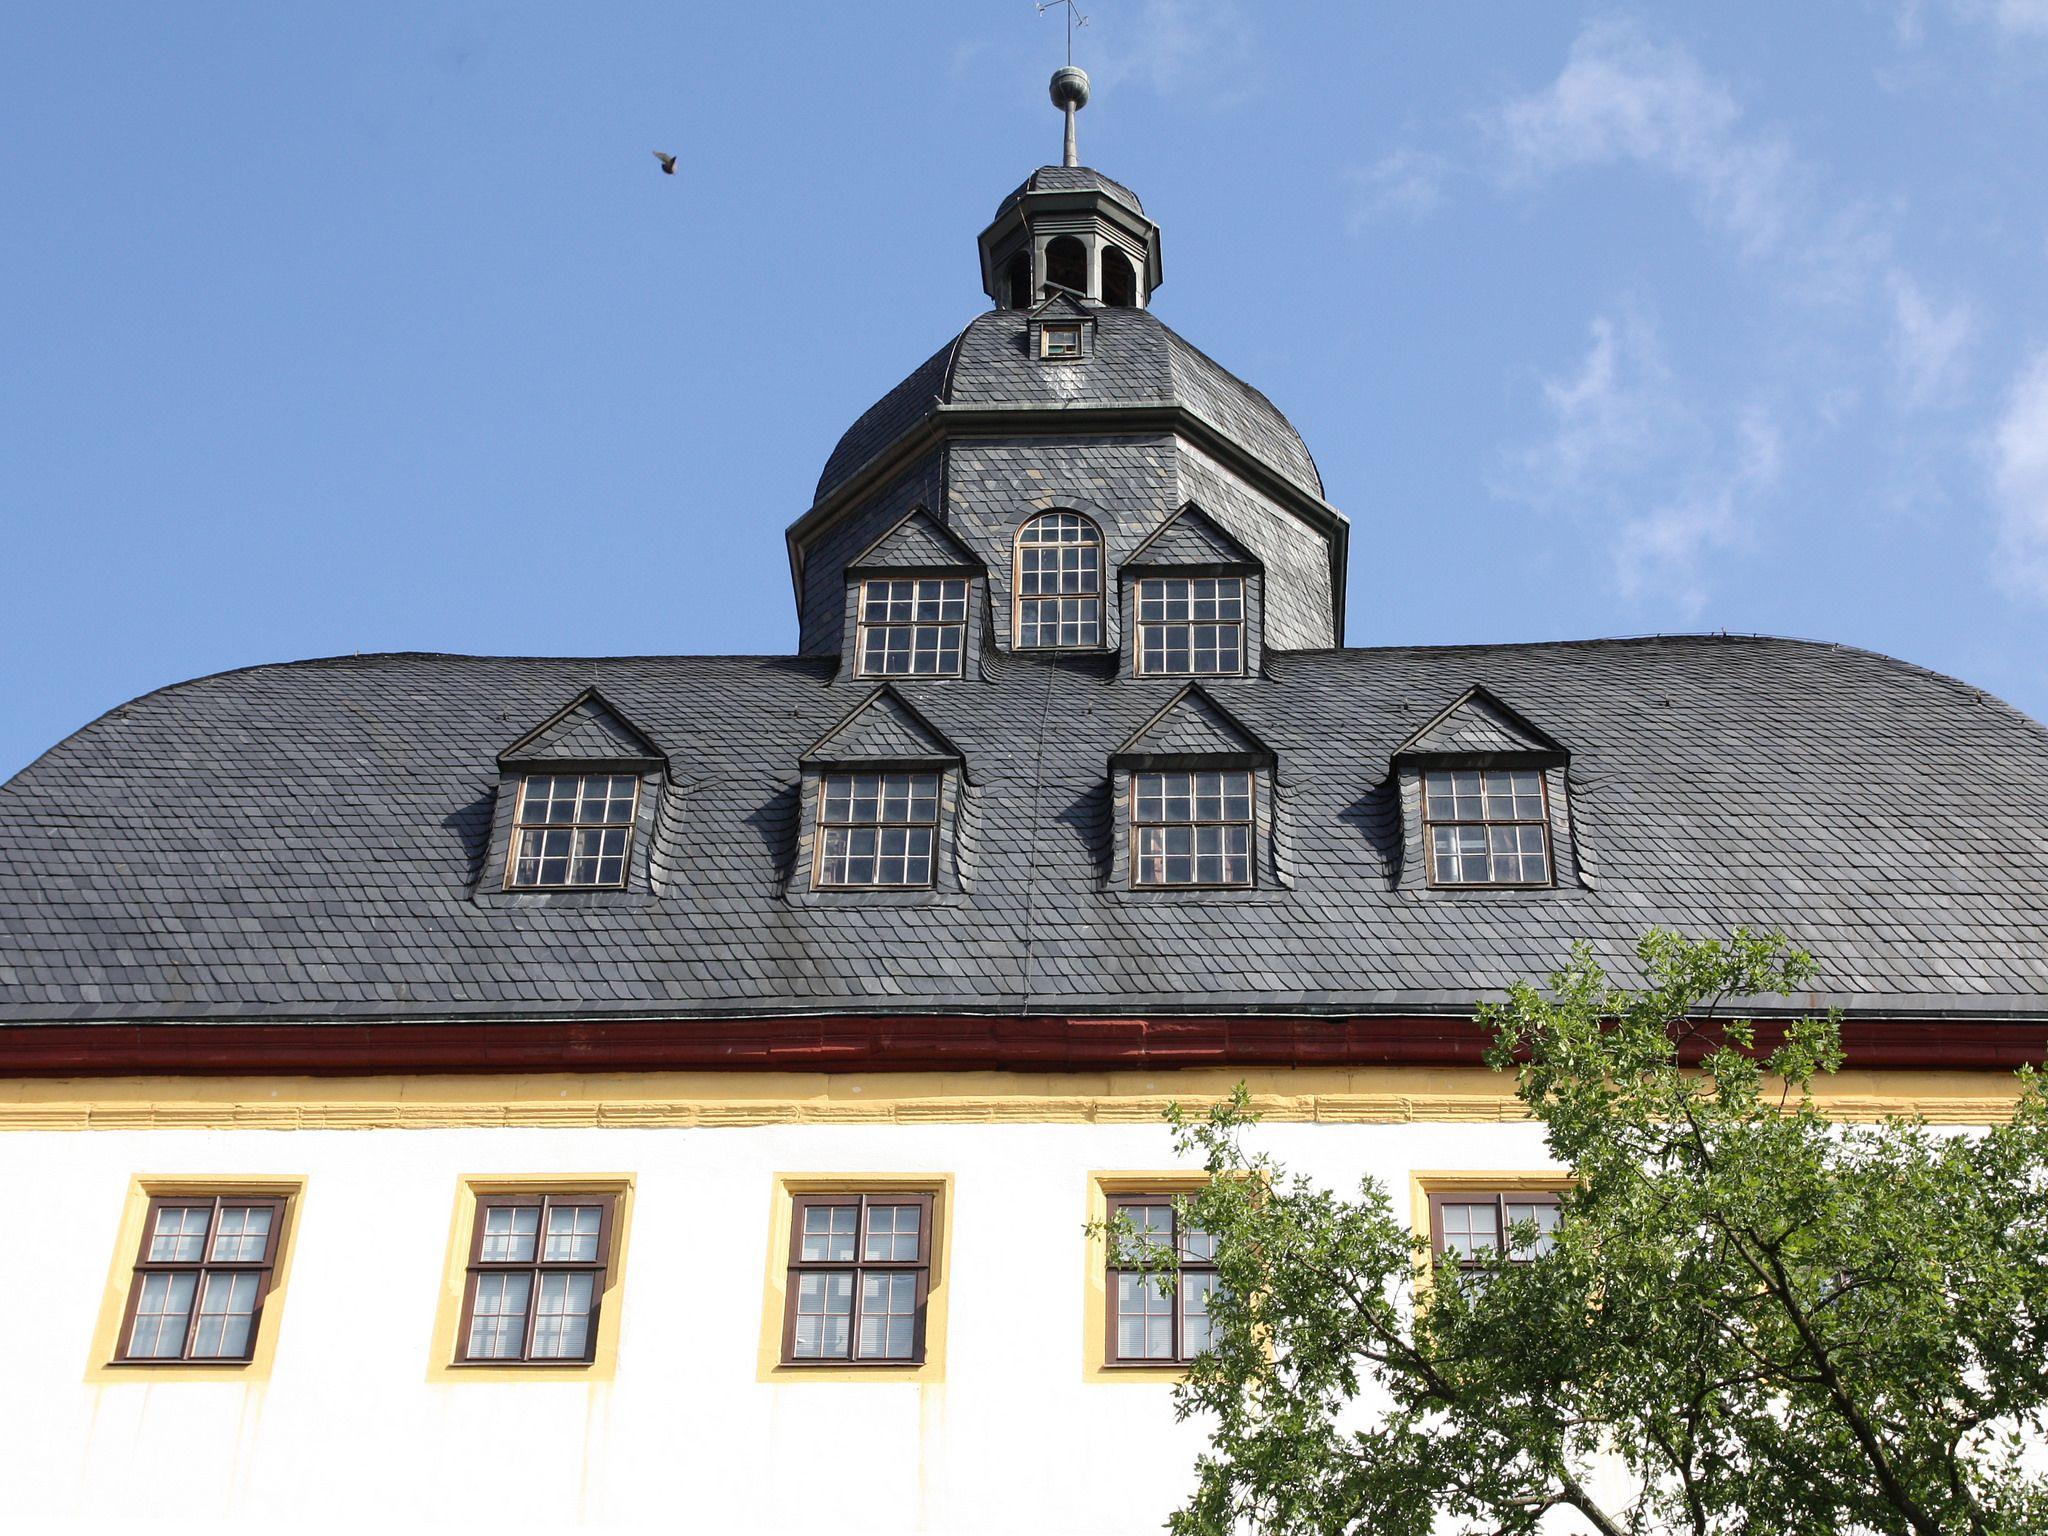 Schloss Friedenstein Burg Gotha Schloss